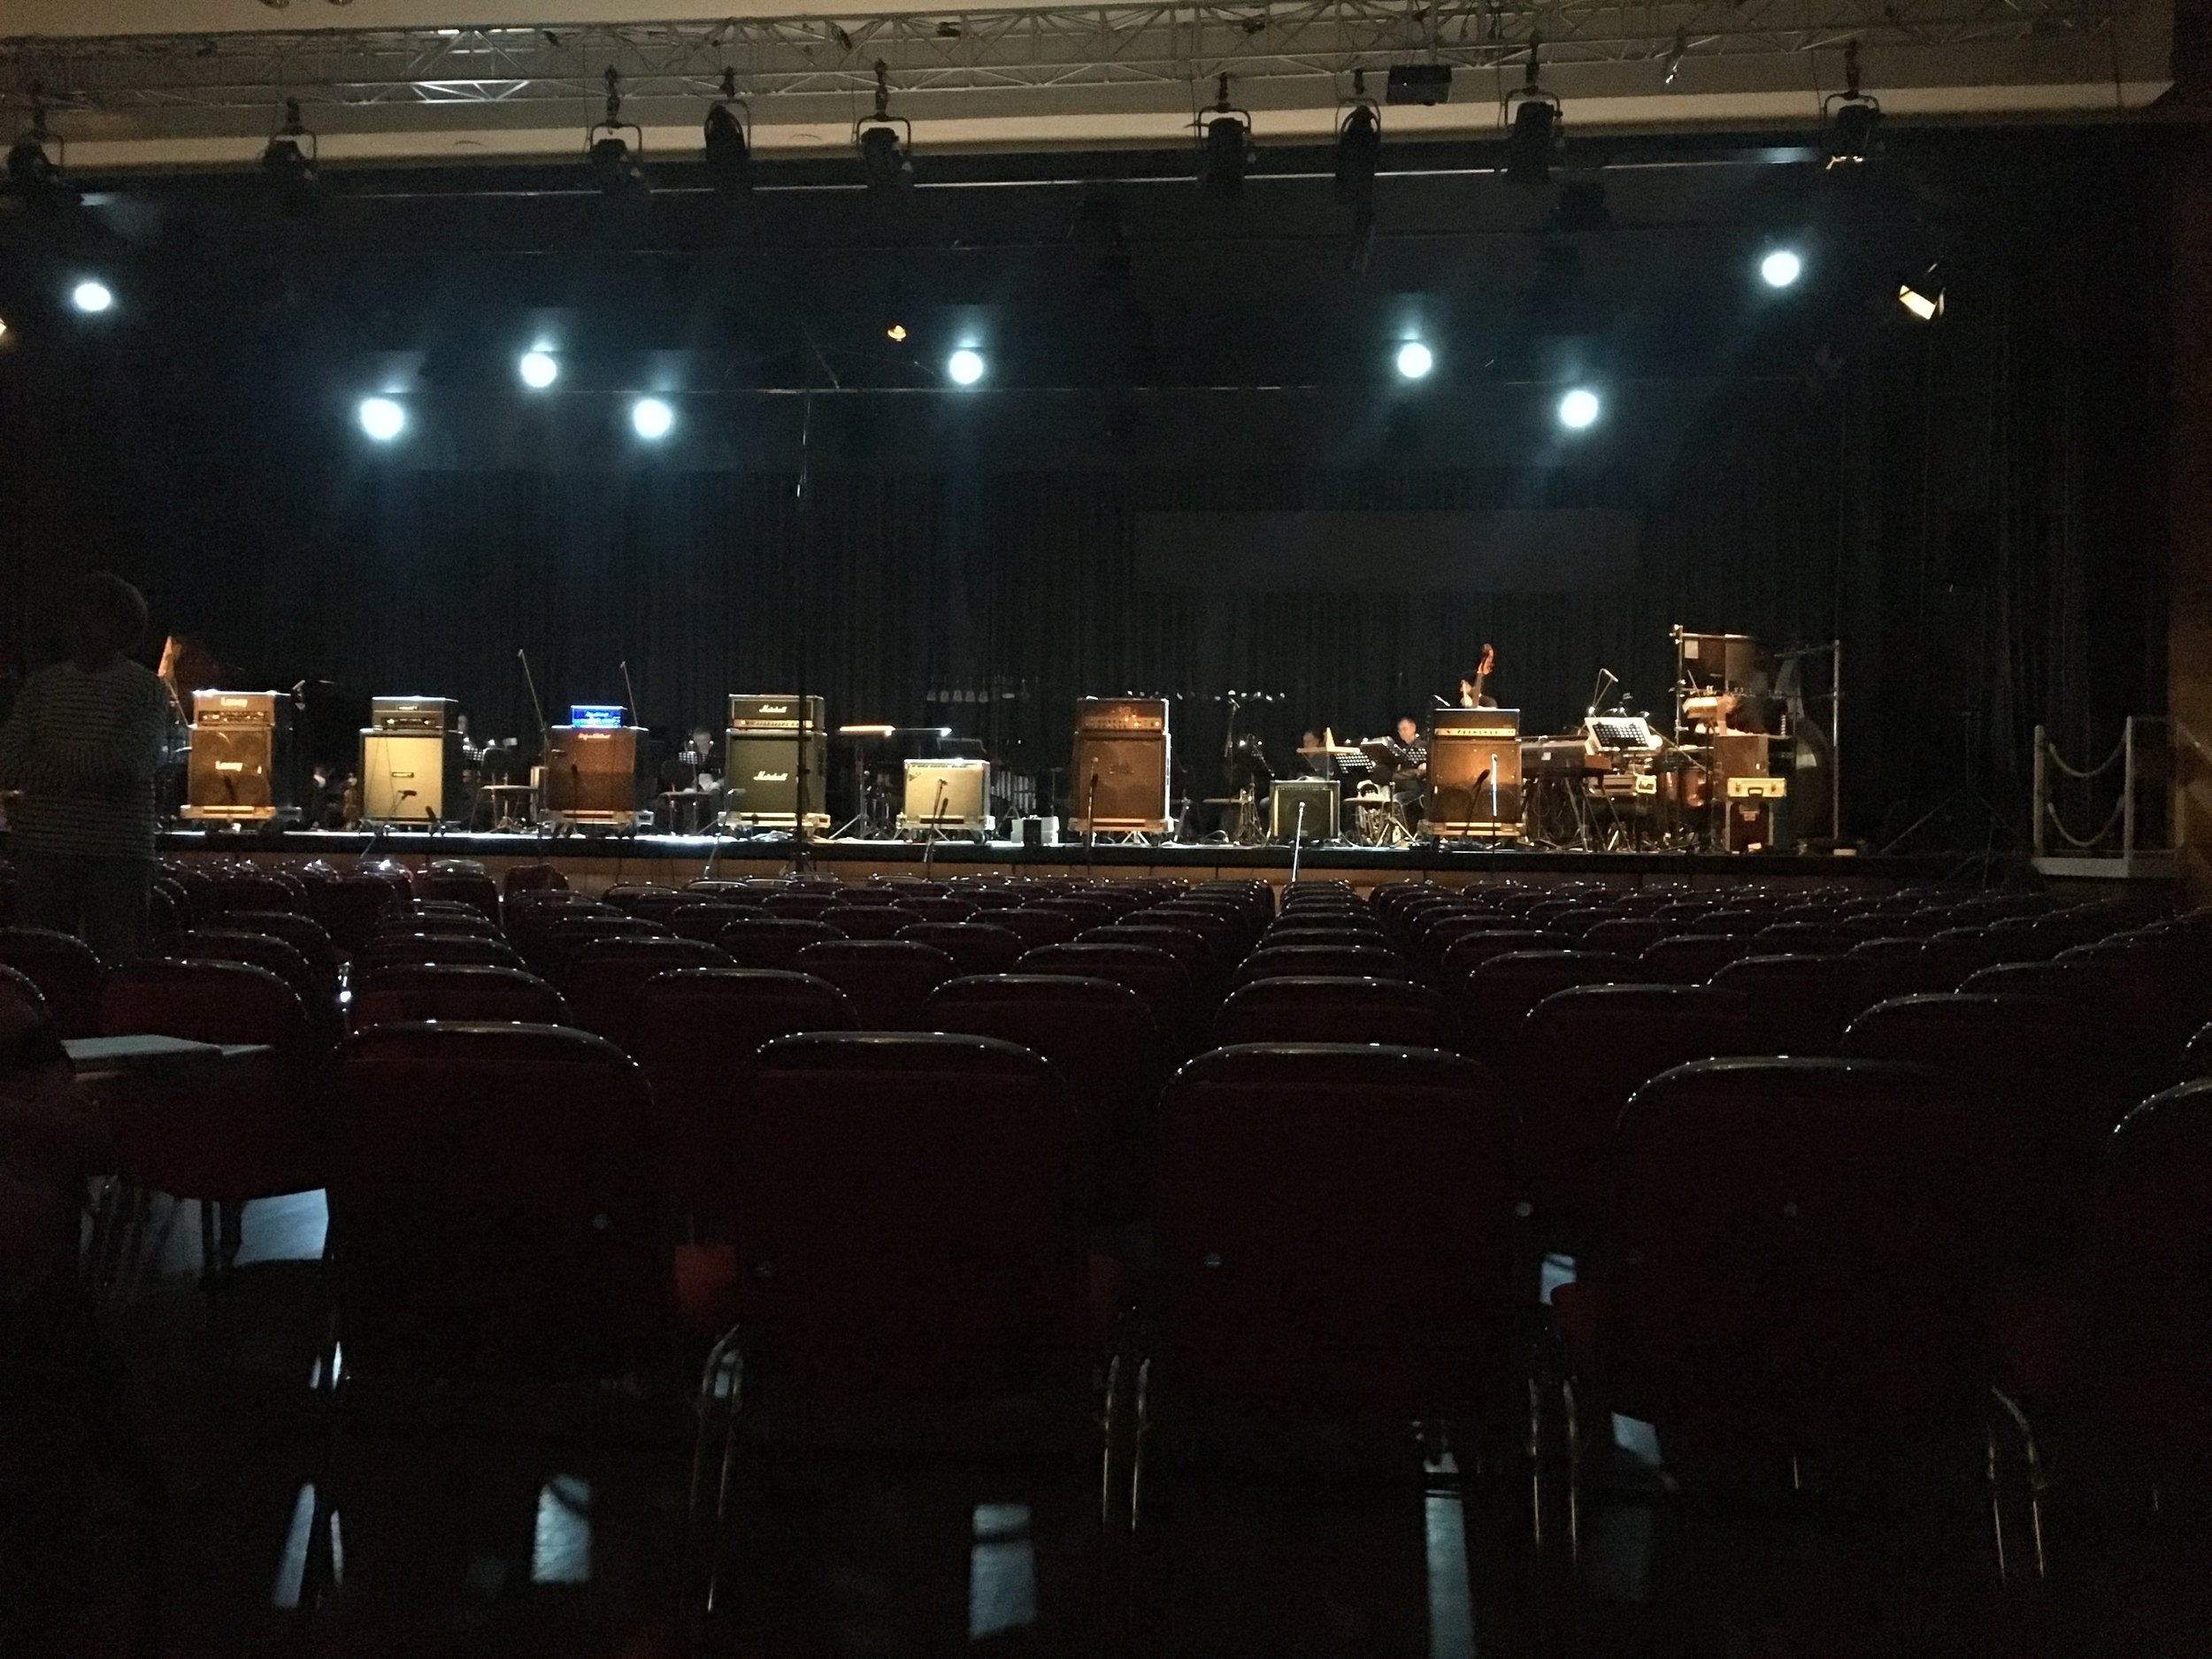 Deathstar Orchestration,  performance./installation view, Donaueschinger Musiktage, October, 2017